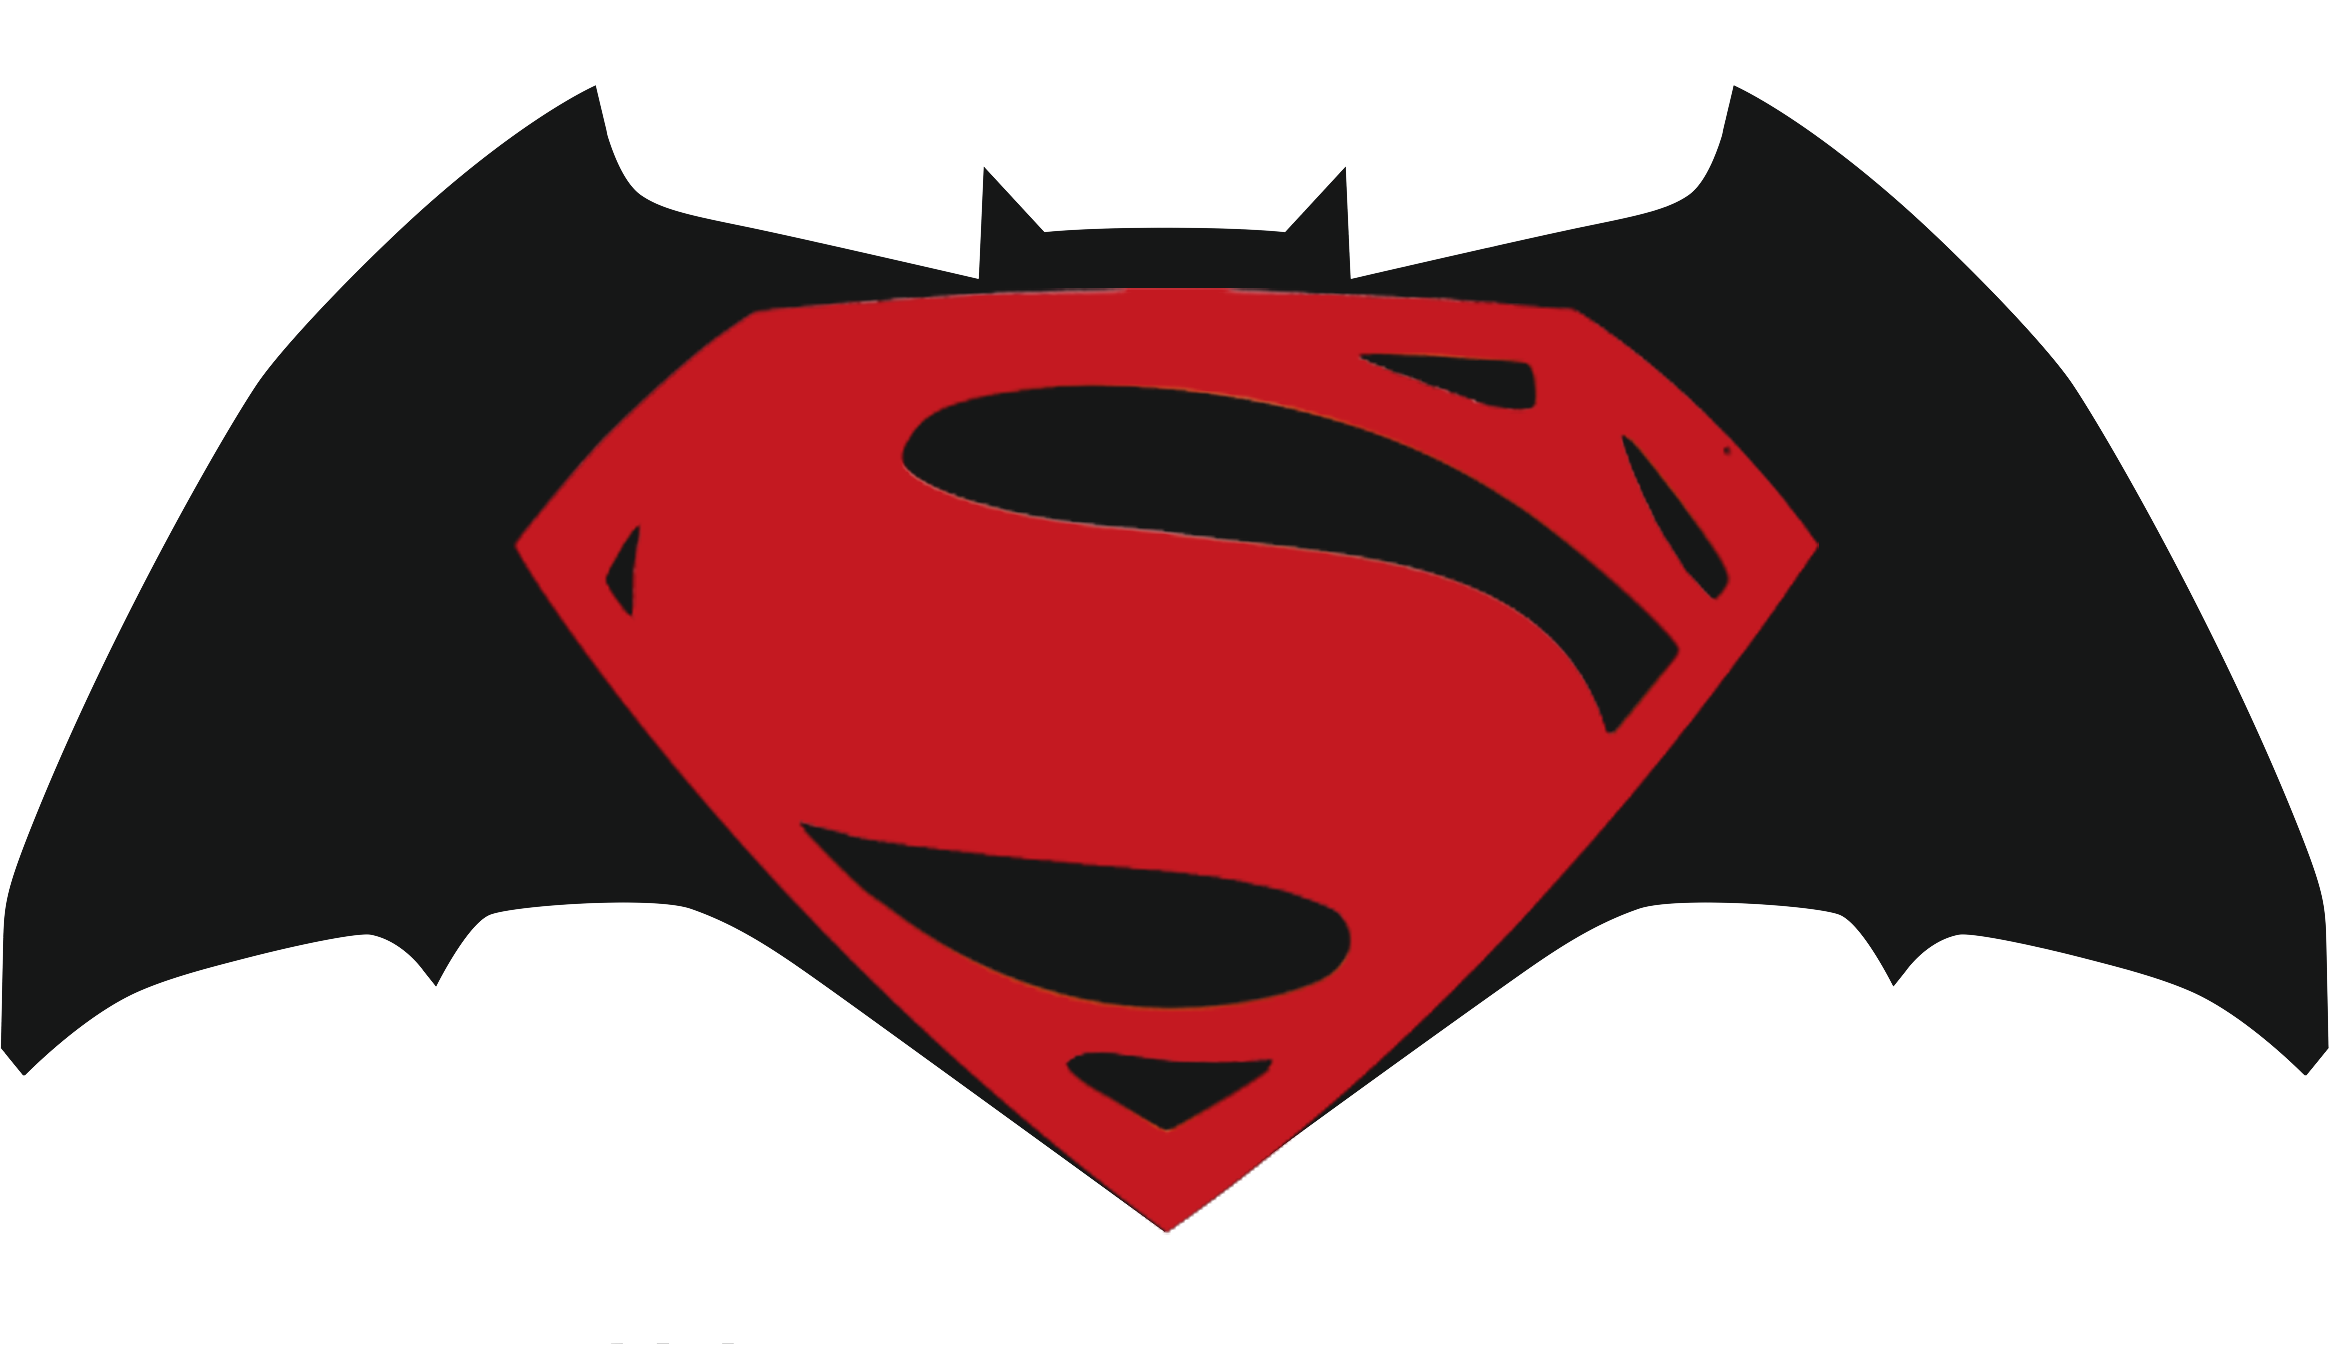 batman v superman logo minimalist by moviesofyalli on